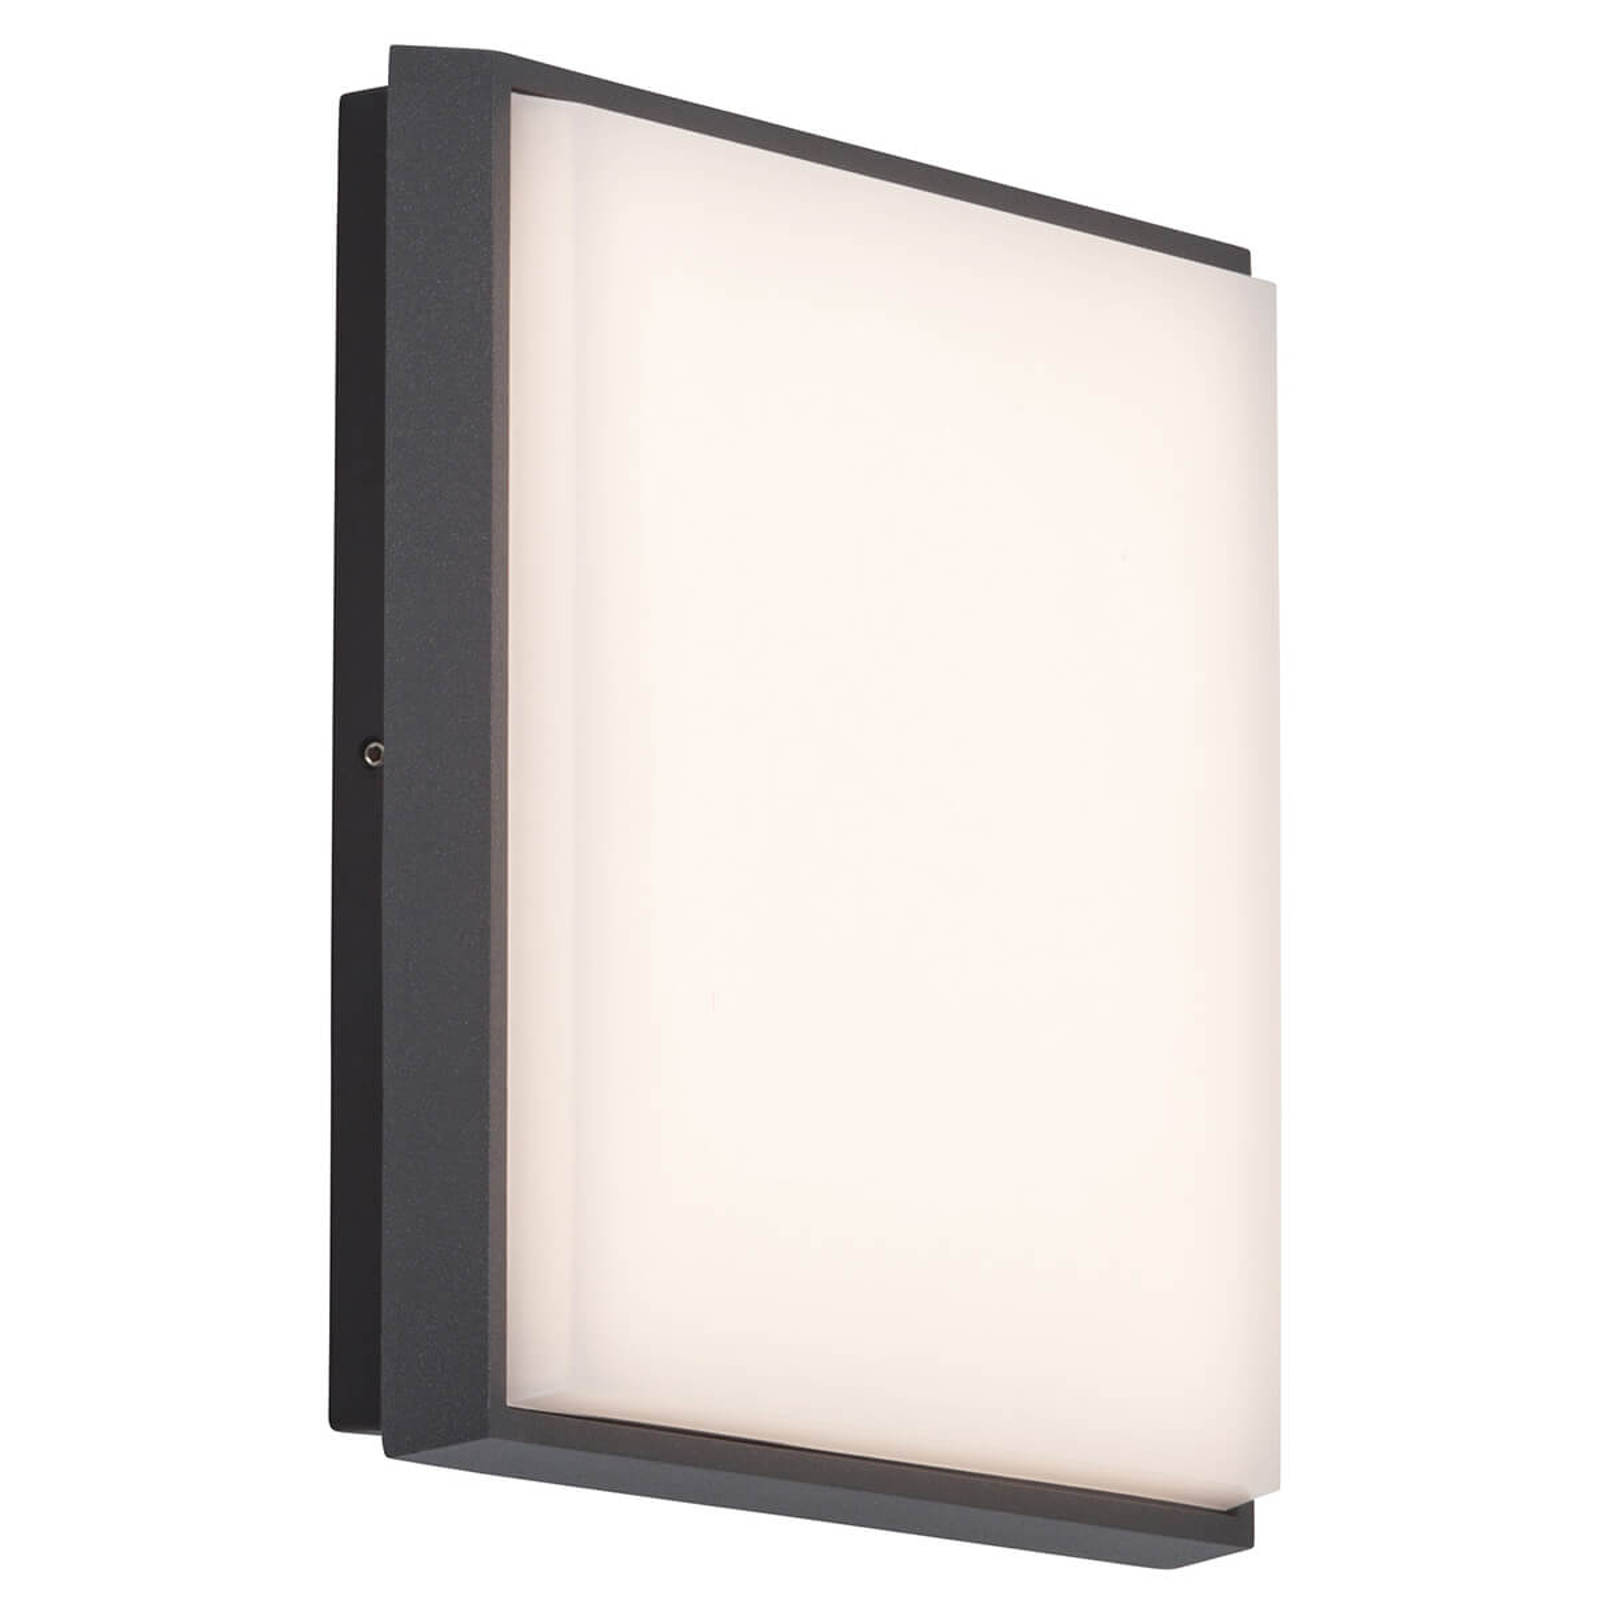 AEG Letan Square - helle LED-Außenwandlampe 23 W